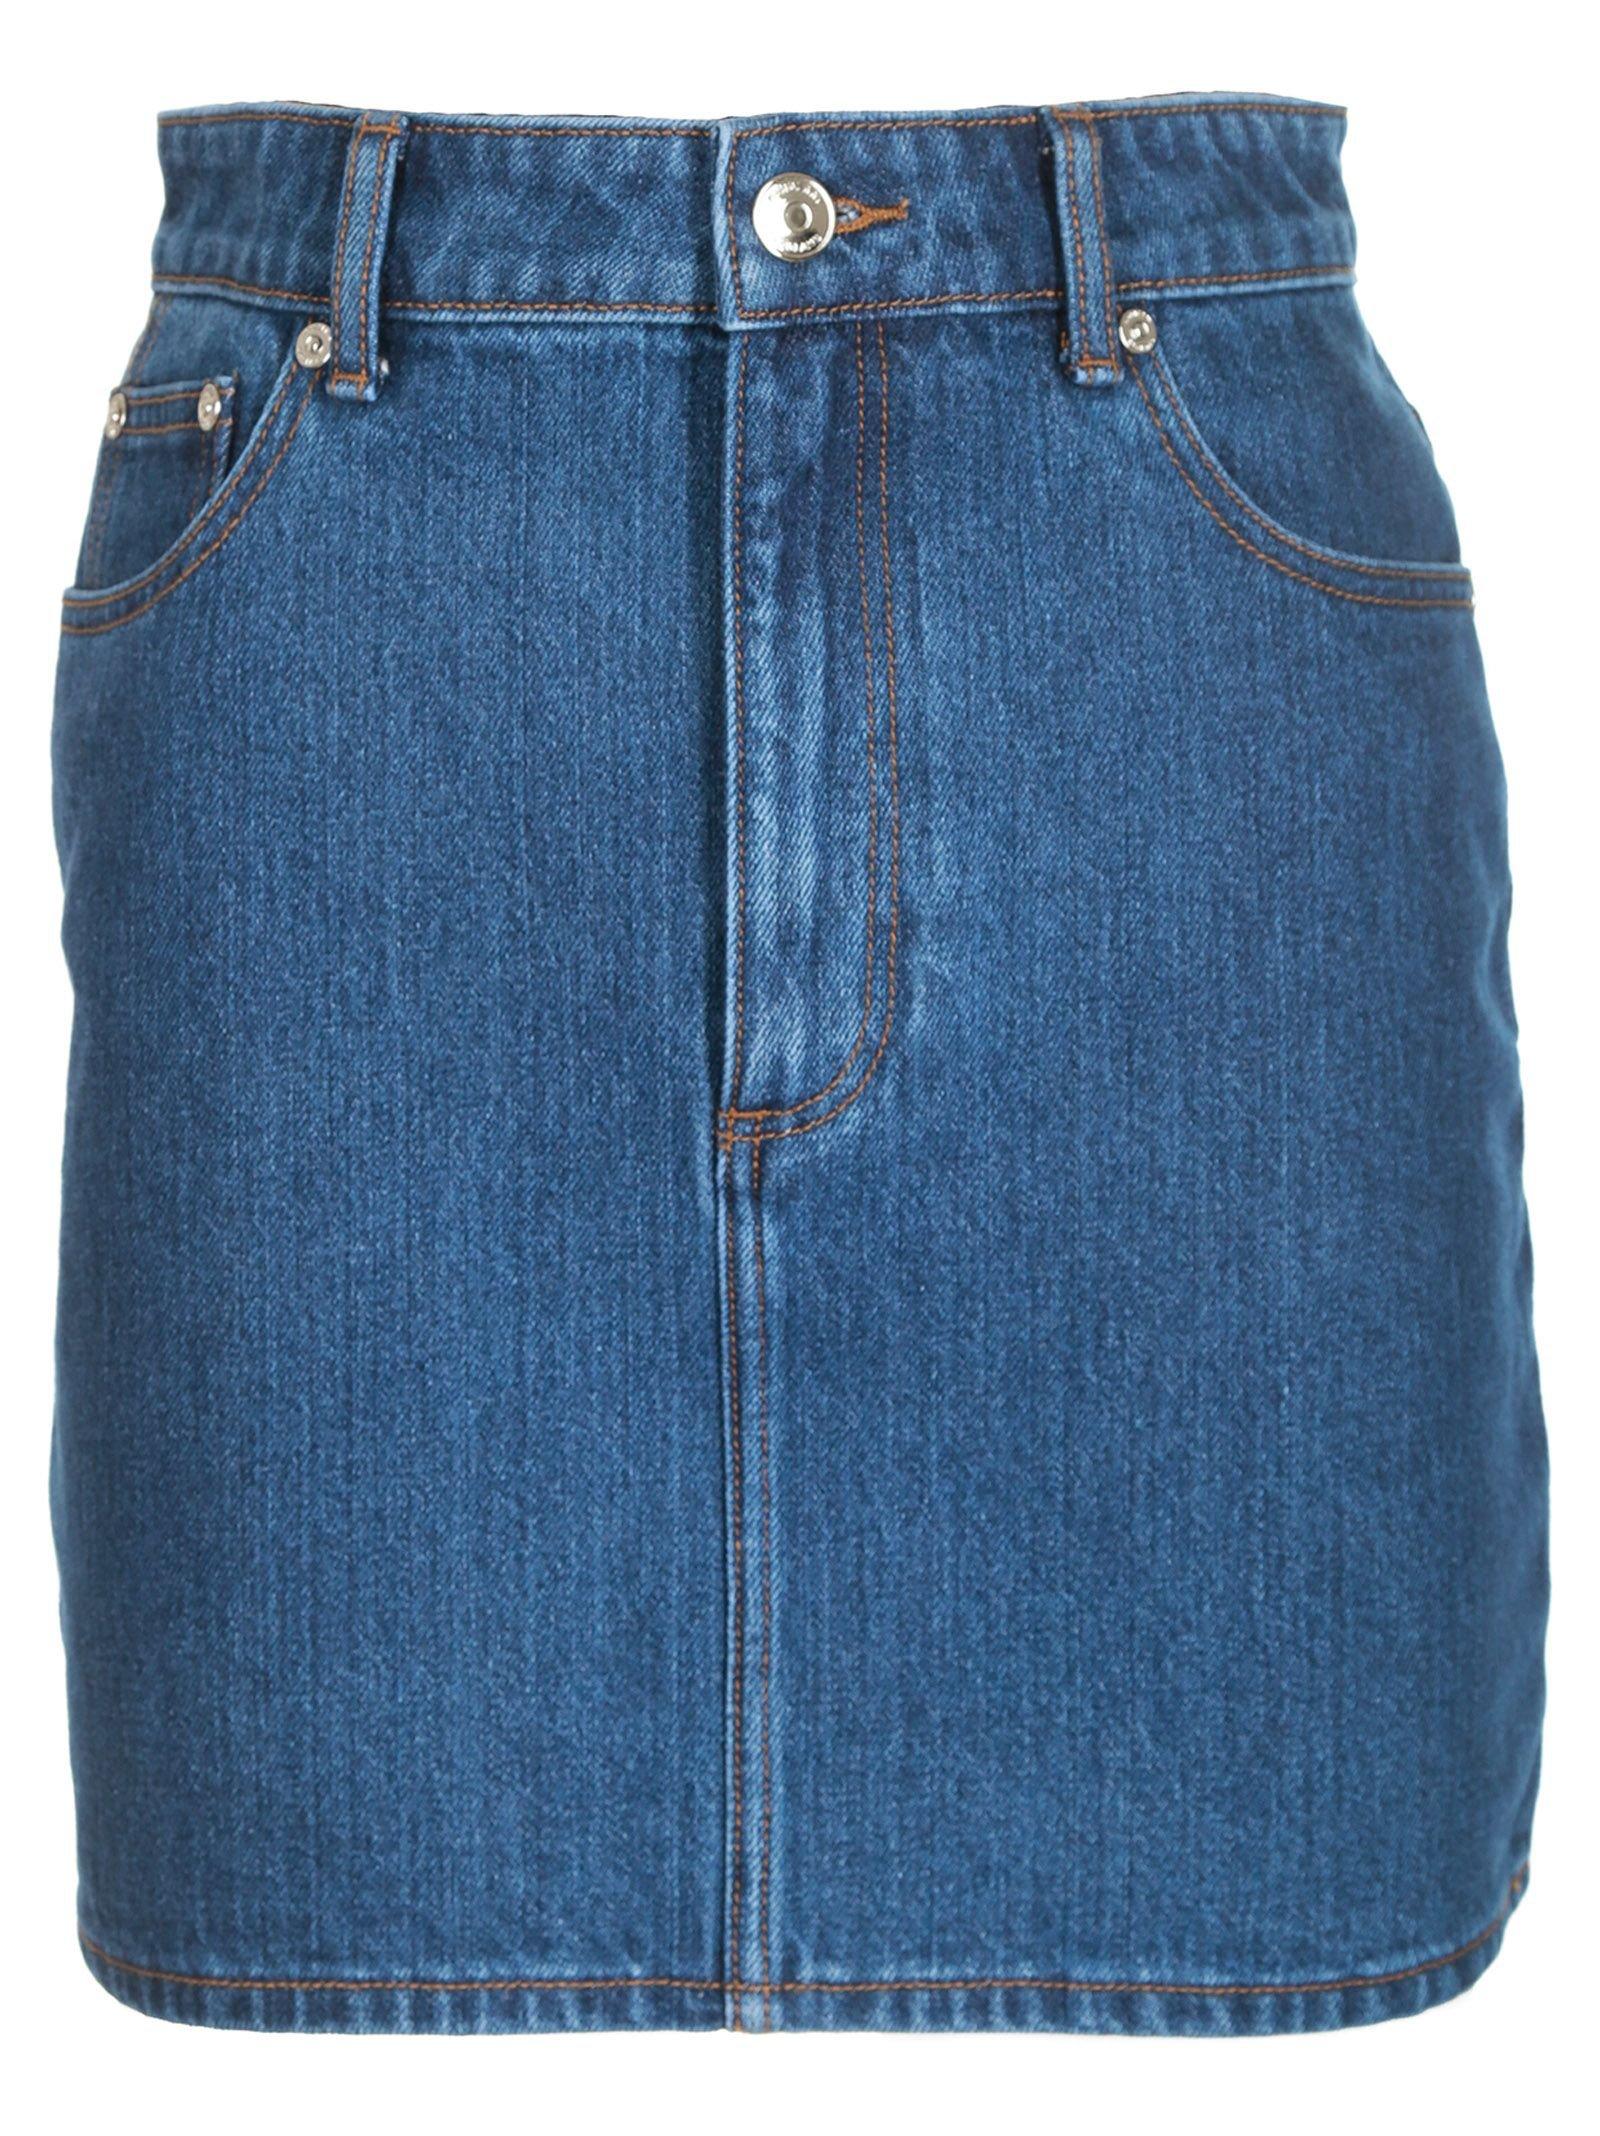 Burberry Denim Skirt